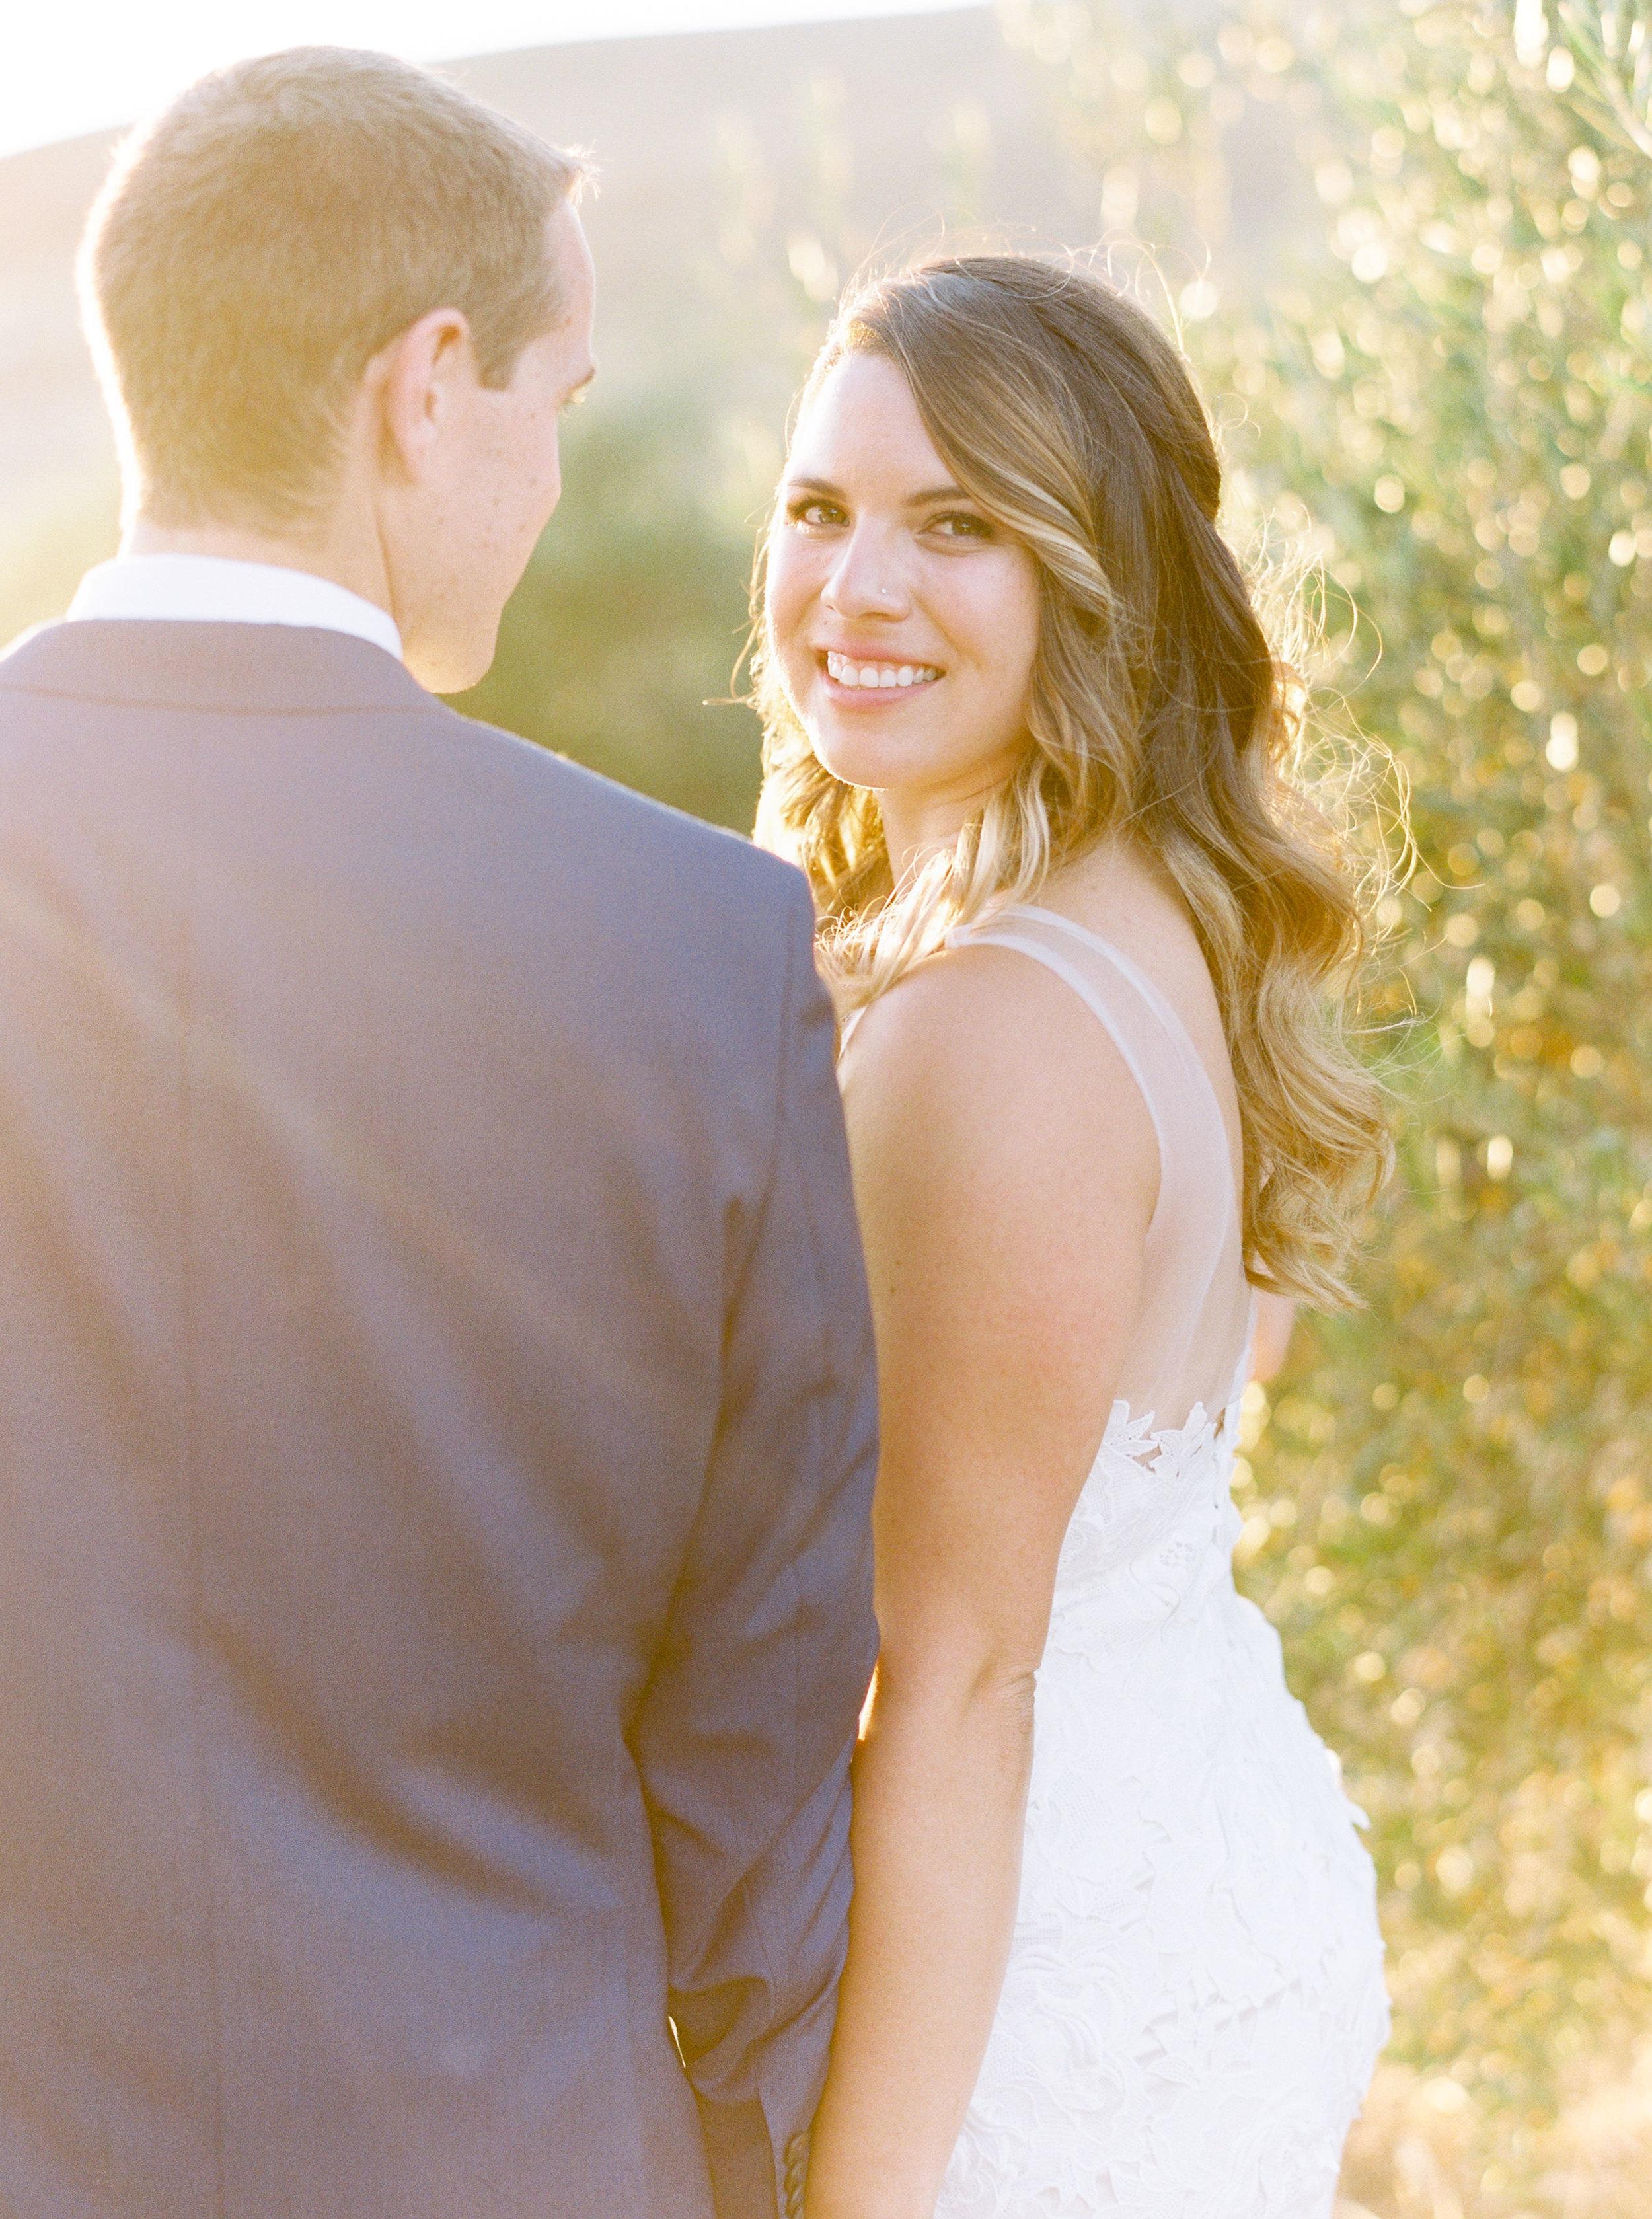 the-purple-orchid-resort-wedding-in-livermore-california-71.jpg